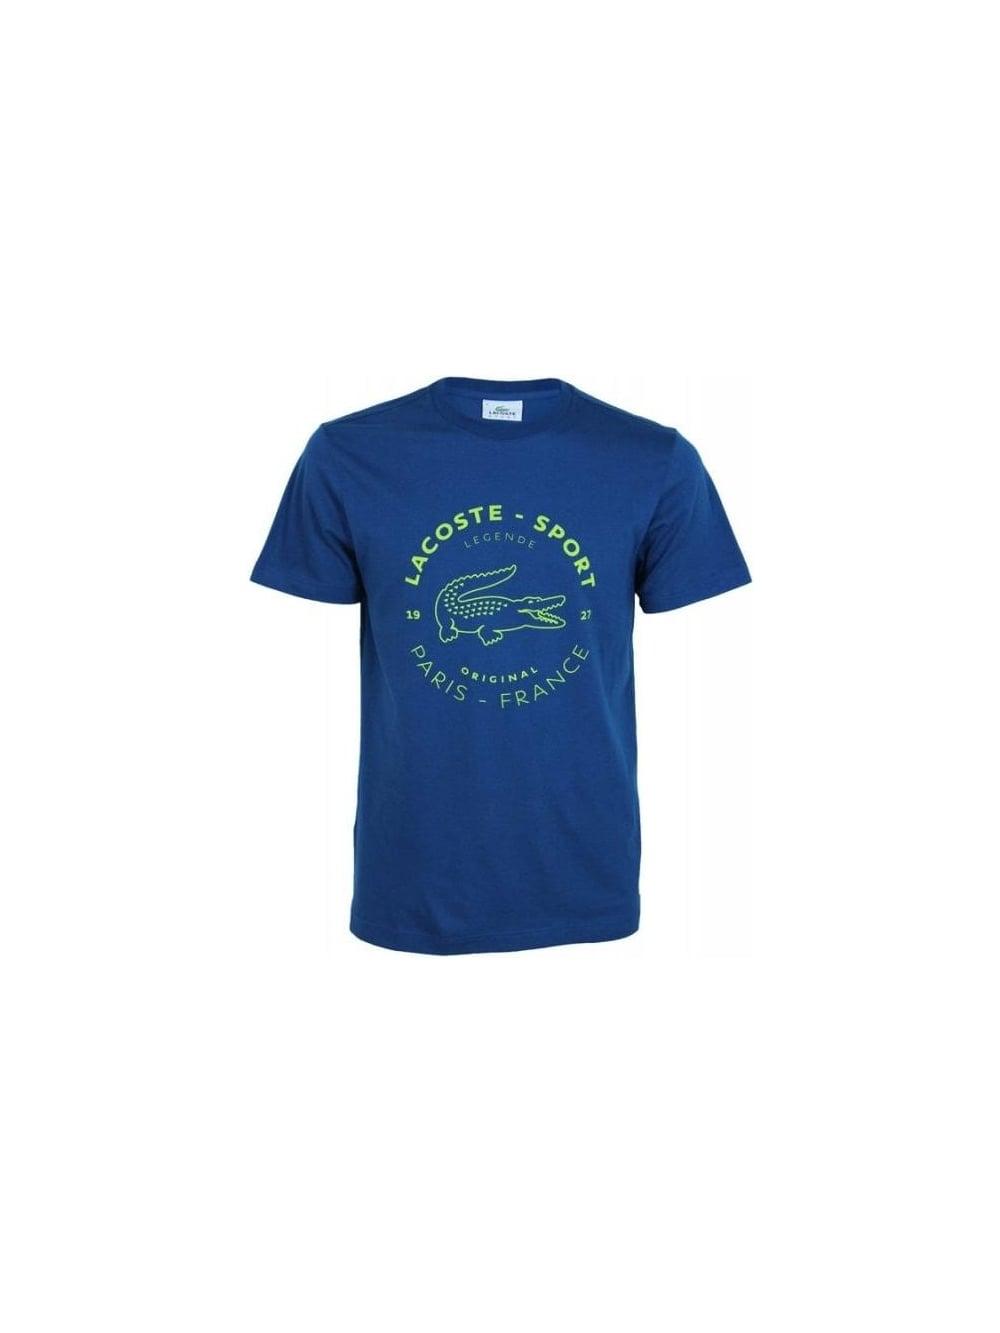 79cd2ee96 Lacoste Sport Big Croc Logo T.Shirt - Northern Threads